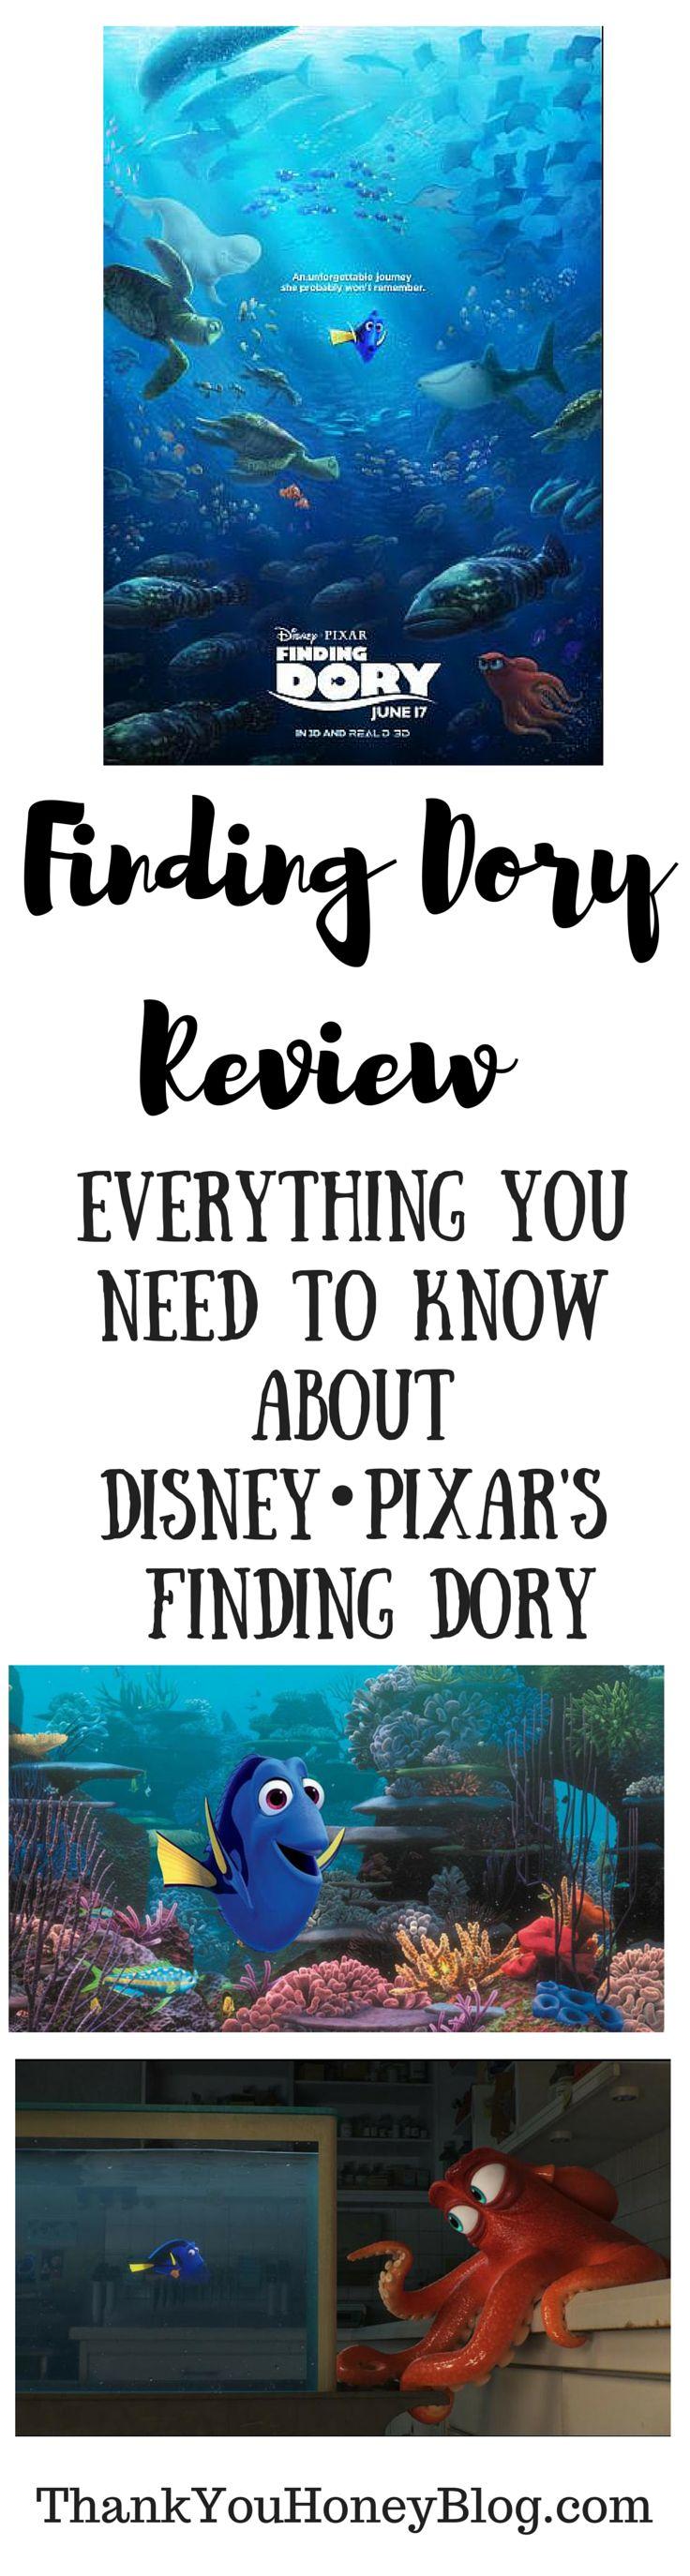 Finding Dory Review, Disney, Disney Pixar Finding Dory, Film, Finding Dory Review, June 19, Movie, Movie Review, review, Trailer, Summer Movies, Thank You Honey, http://thankyouhoneyblog.com